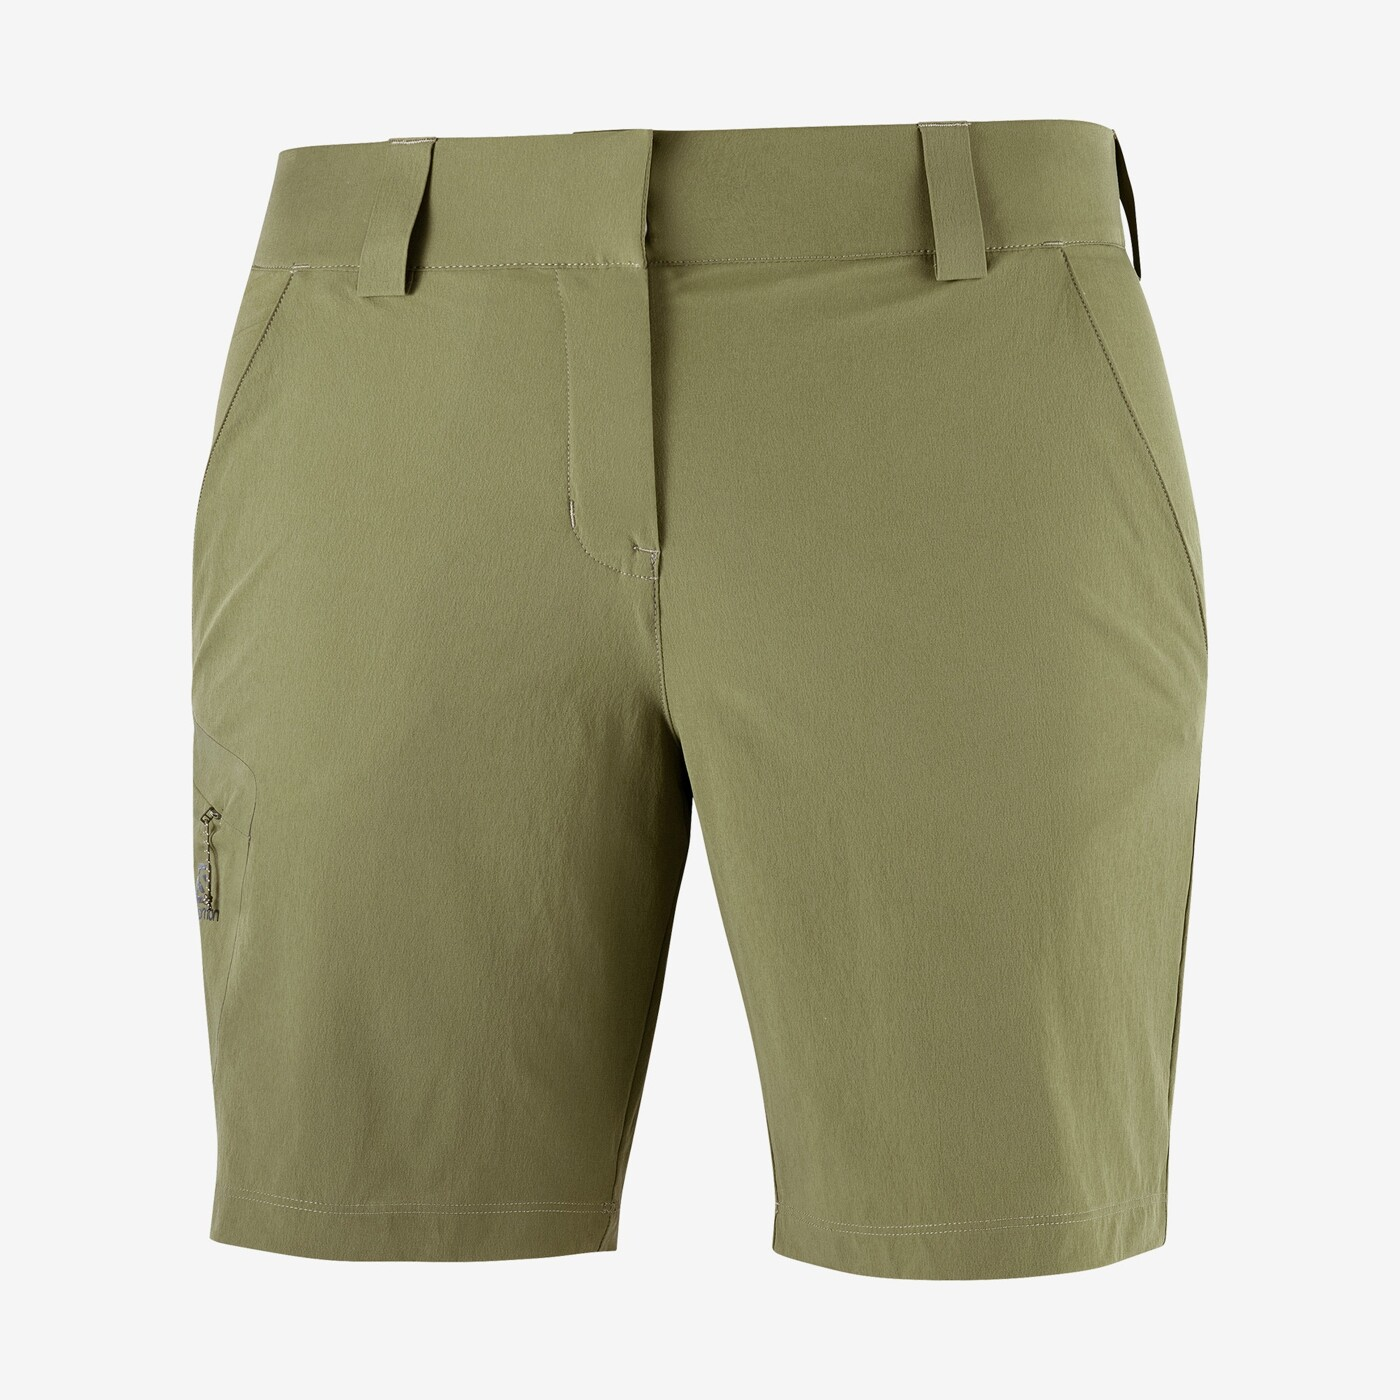 SALOMON WAYFARER - Shorts - Damen